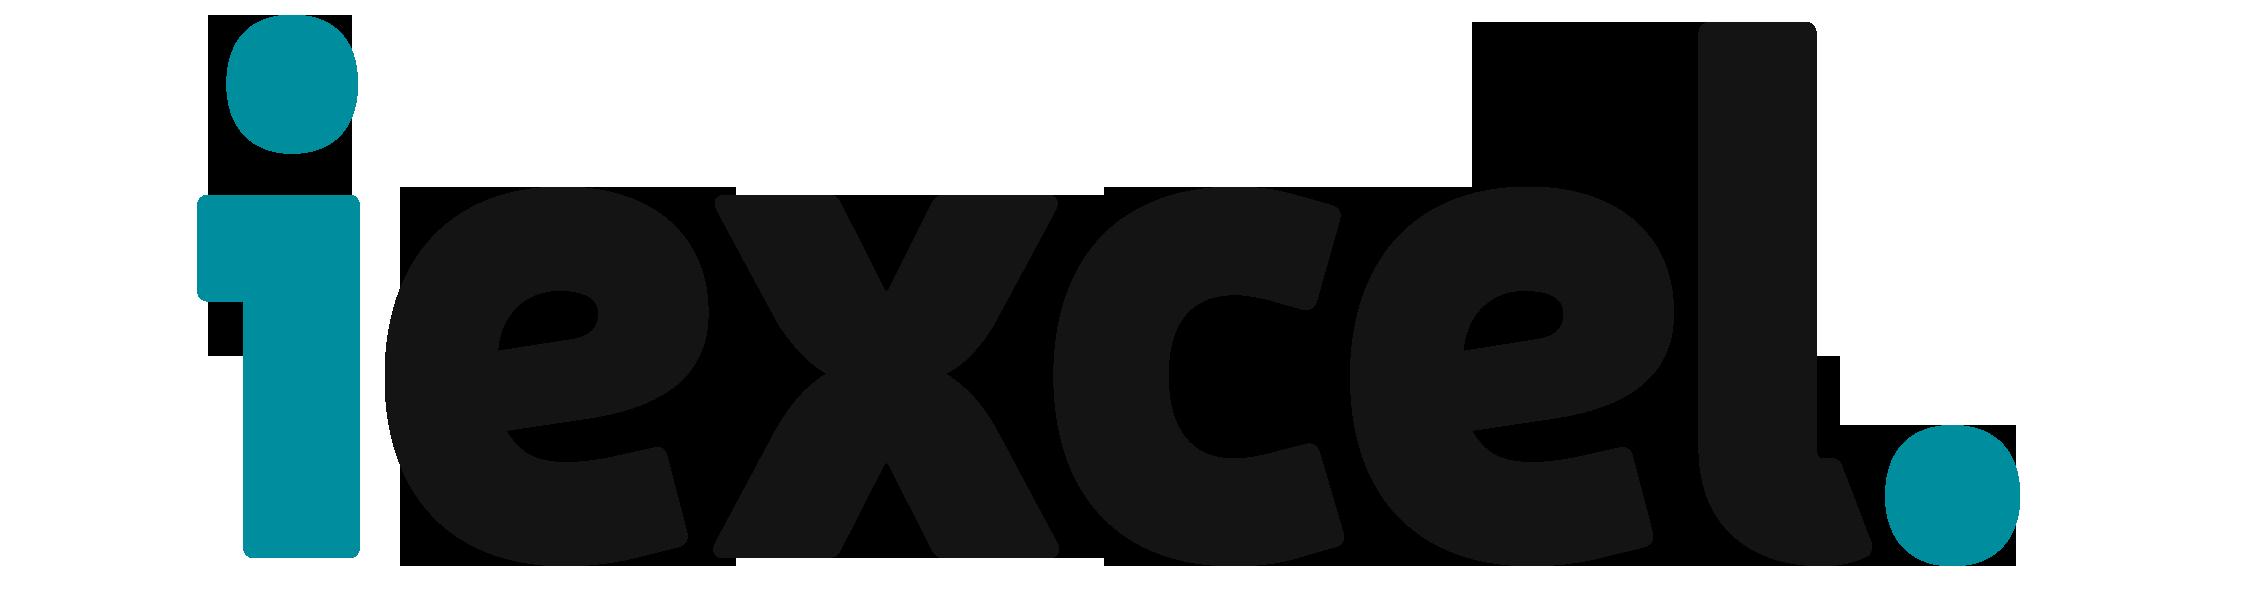 iExcel - Growth Marketing + Demand Generation